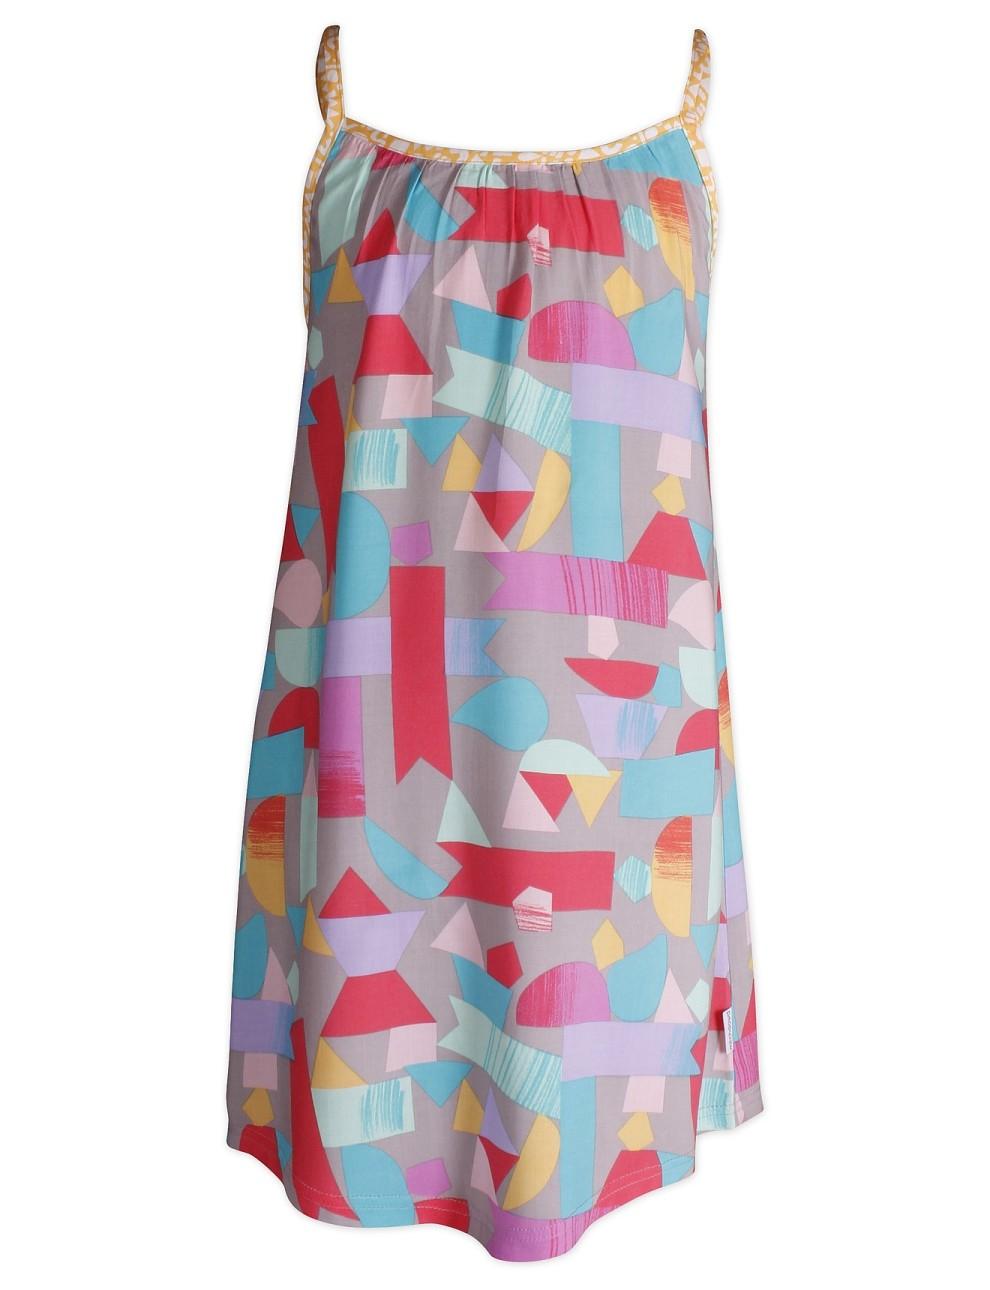 Modern Multicolored Printed Nightwear